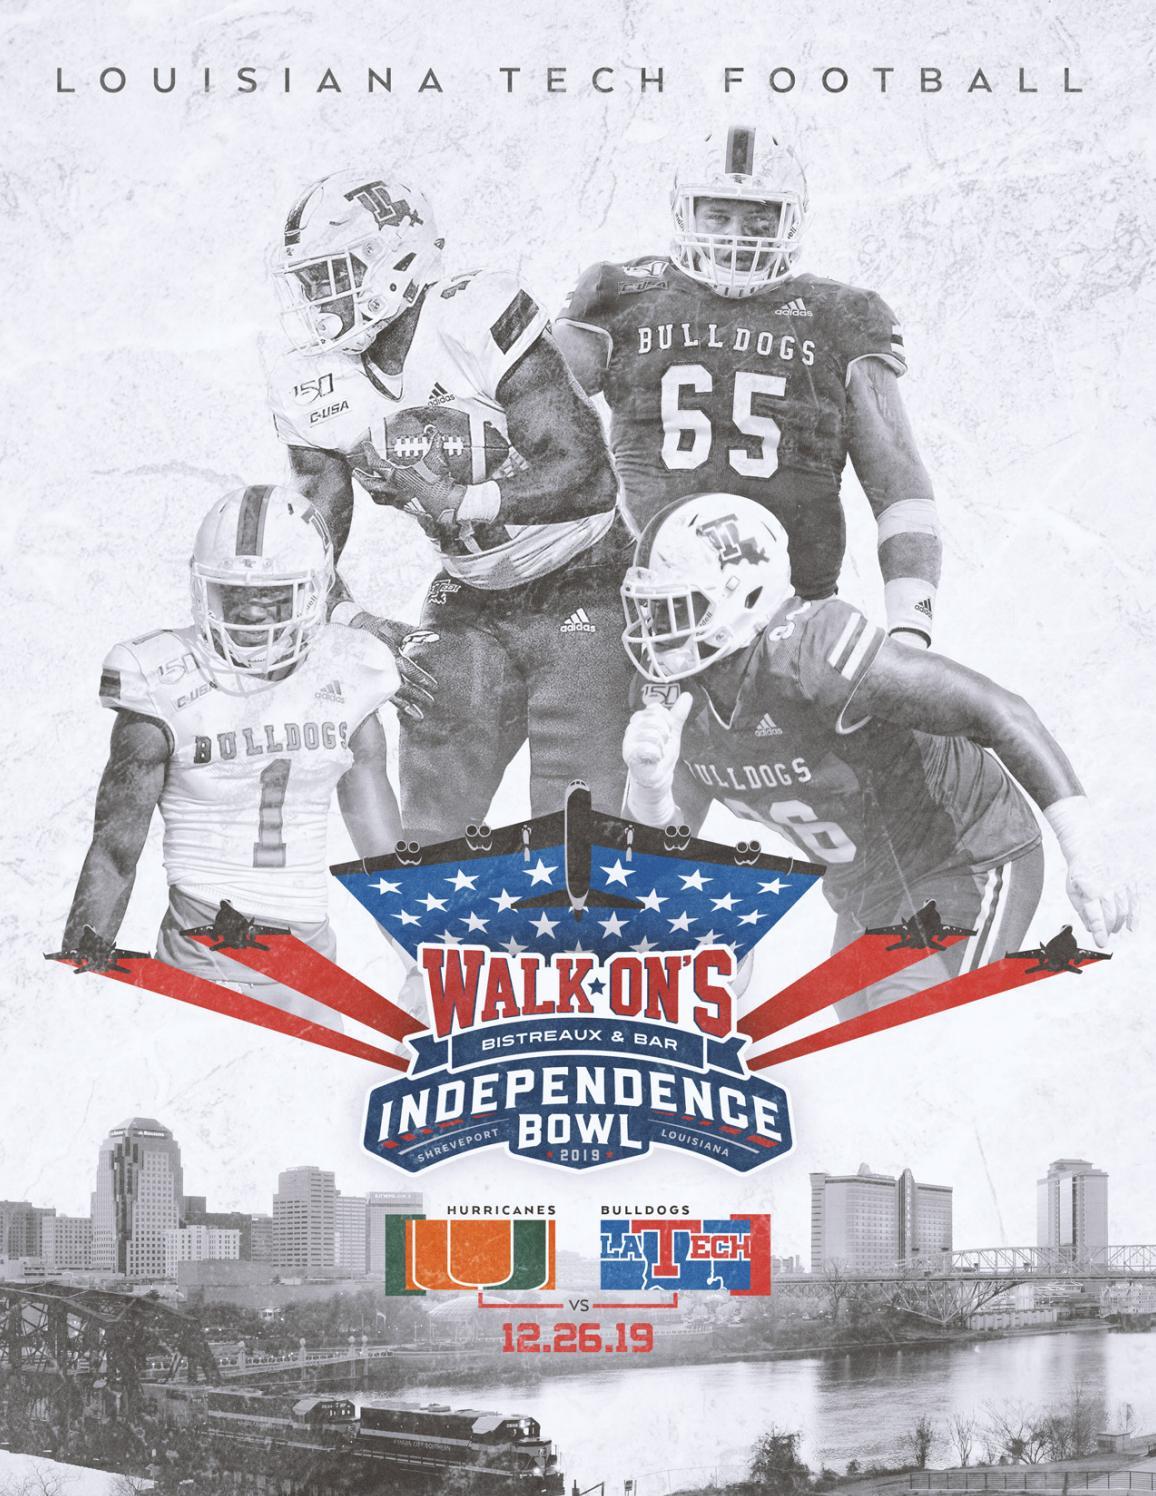 2019 Louisiana Tech Independence Bowl Guide By Louisiana Tech Athletics Issuu